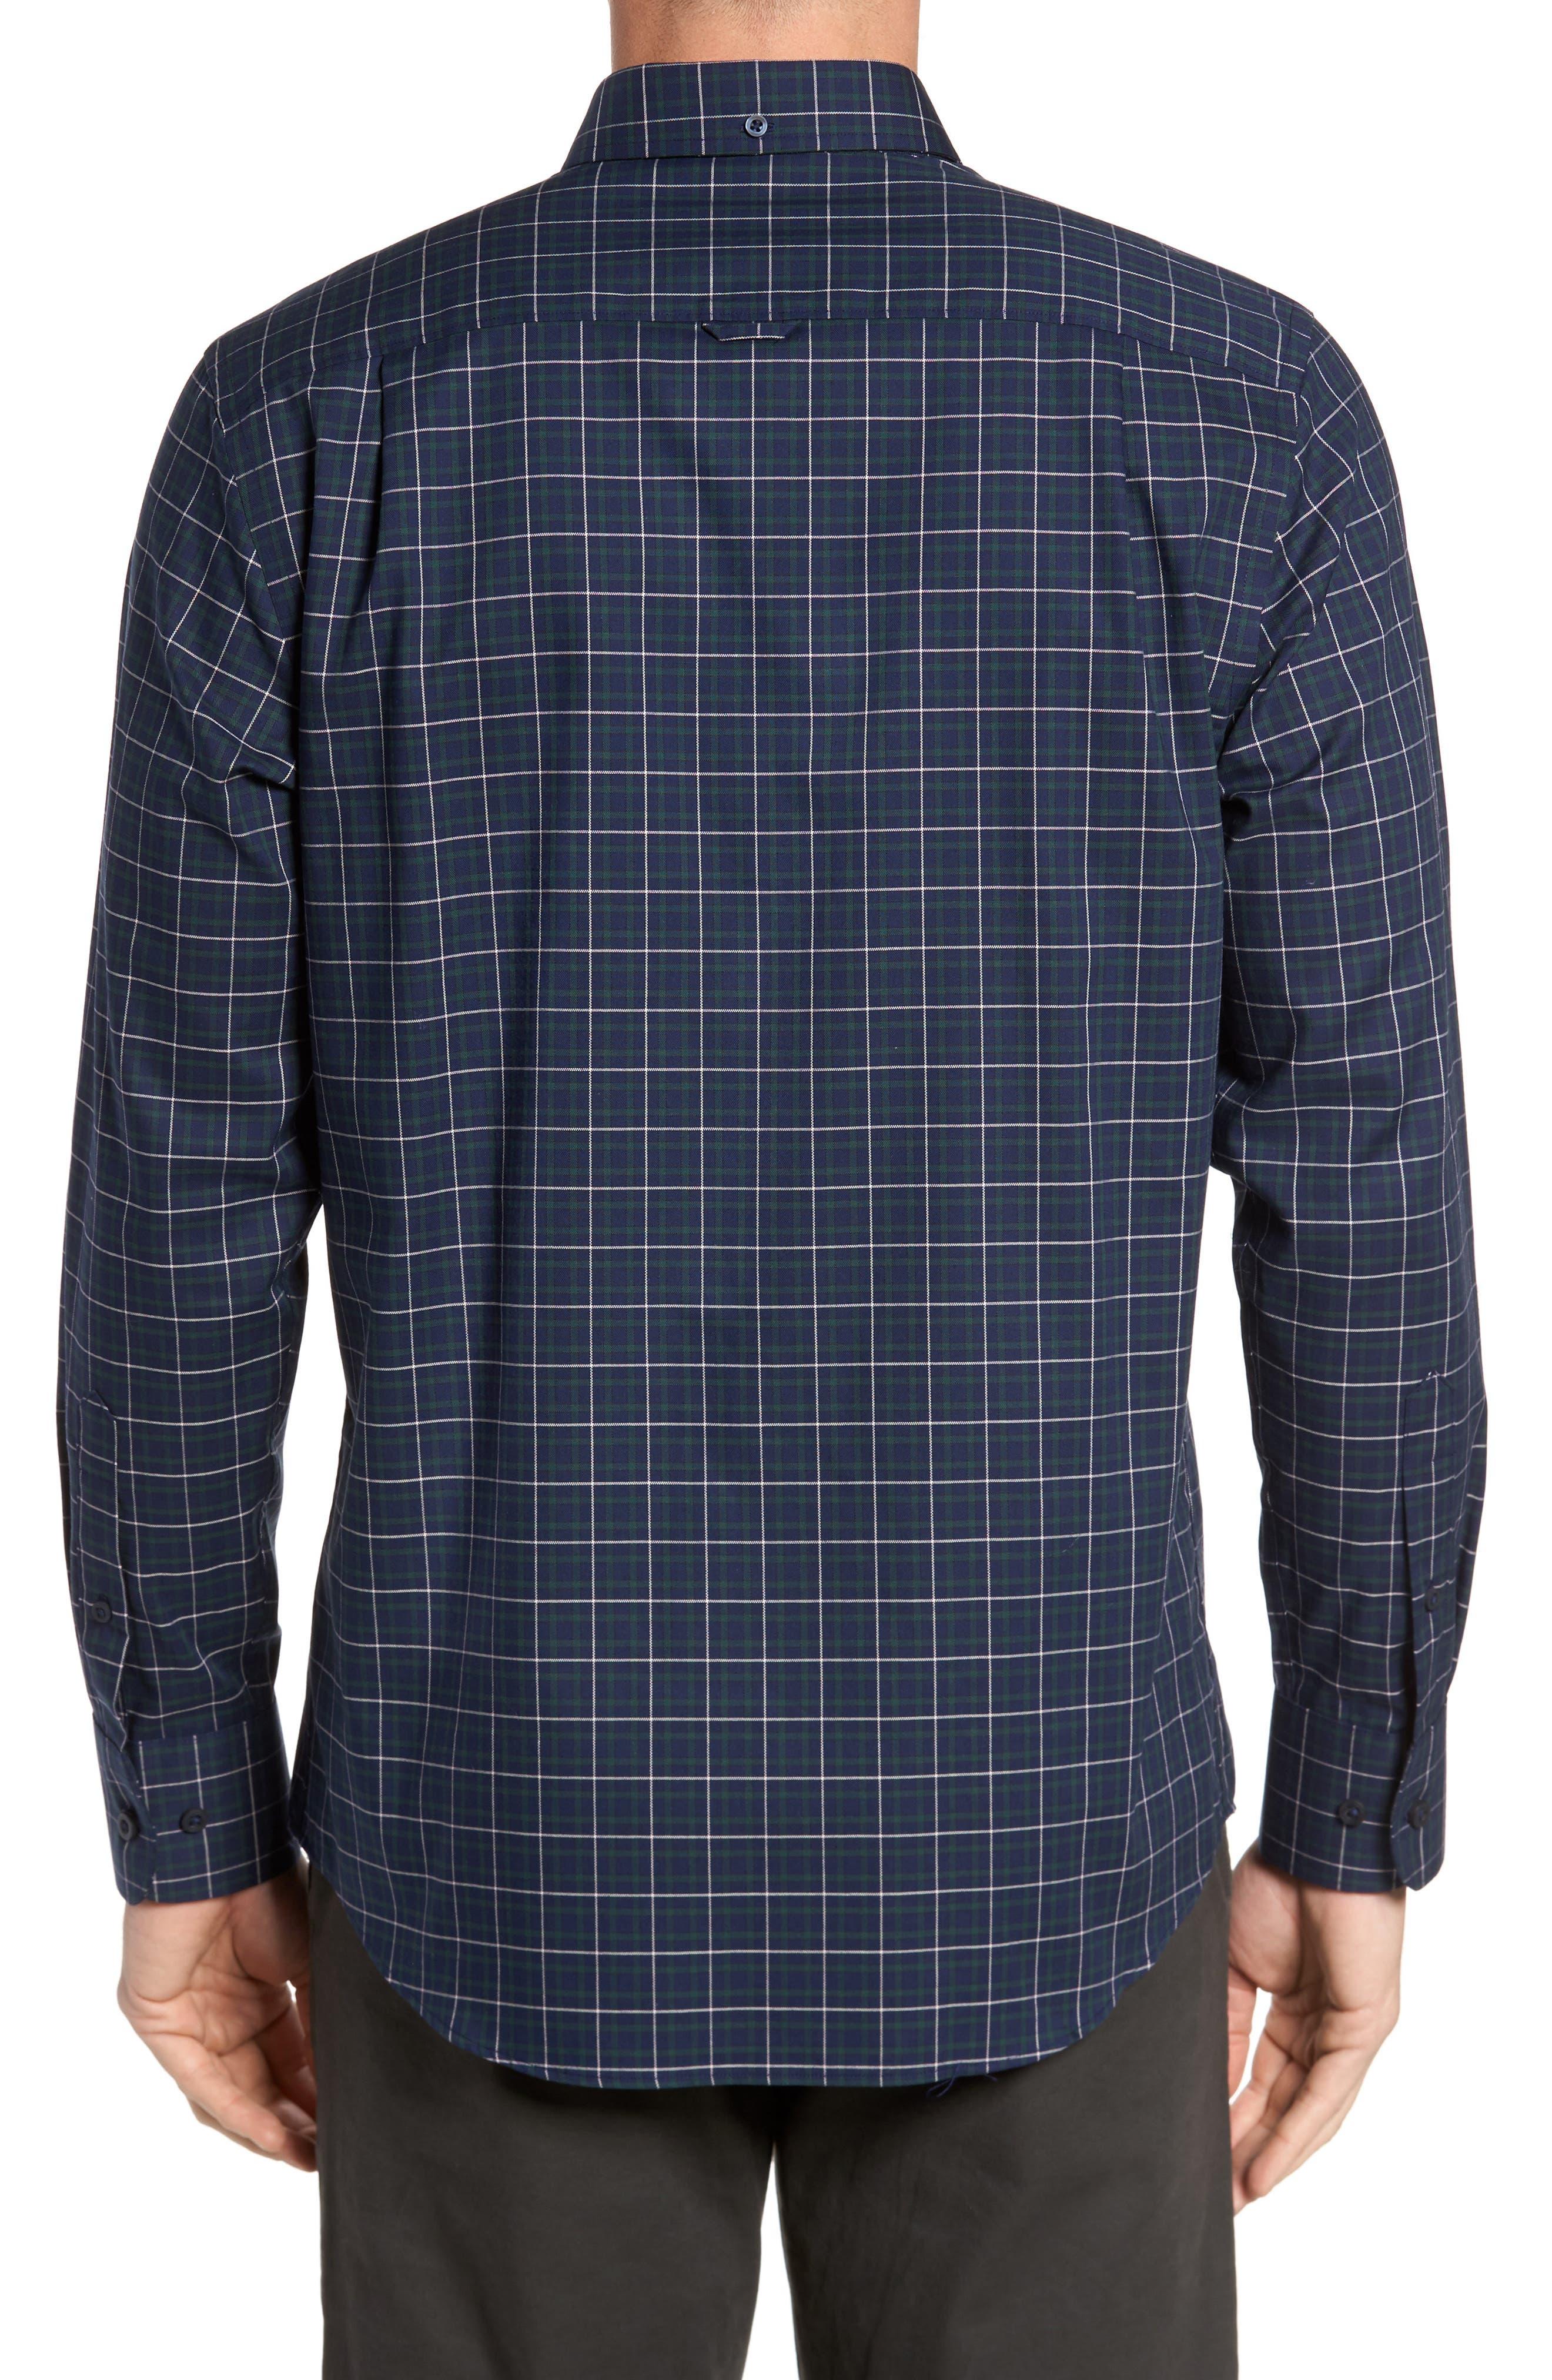 Alternate Image 2  - Nordstrom Men's Shop Regular Fit Non-Iron Plaid Sport Shirt